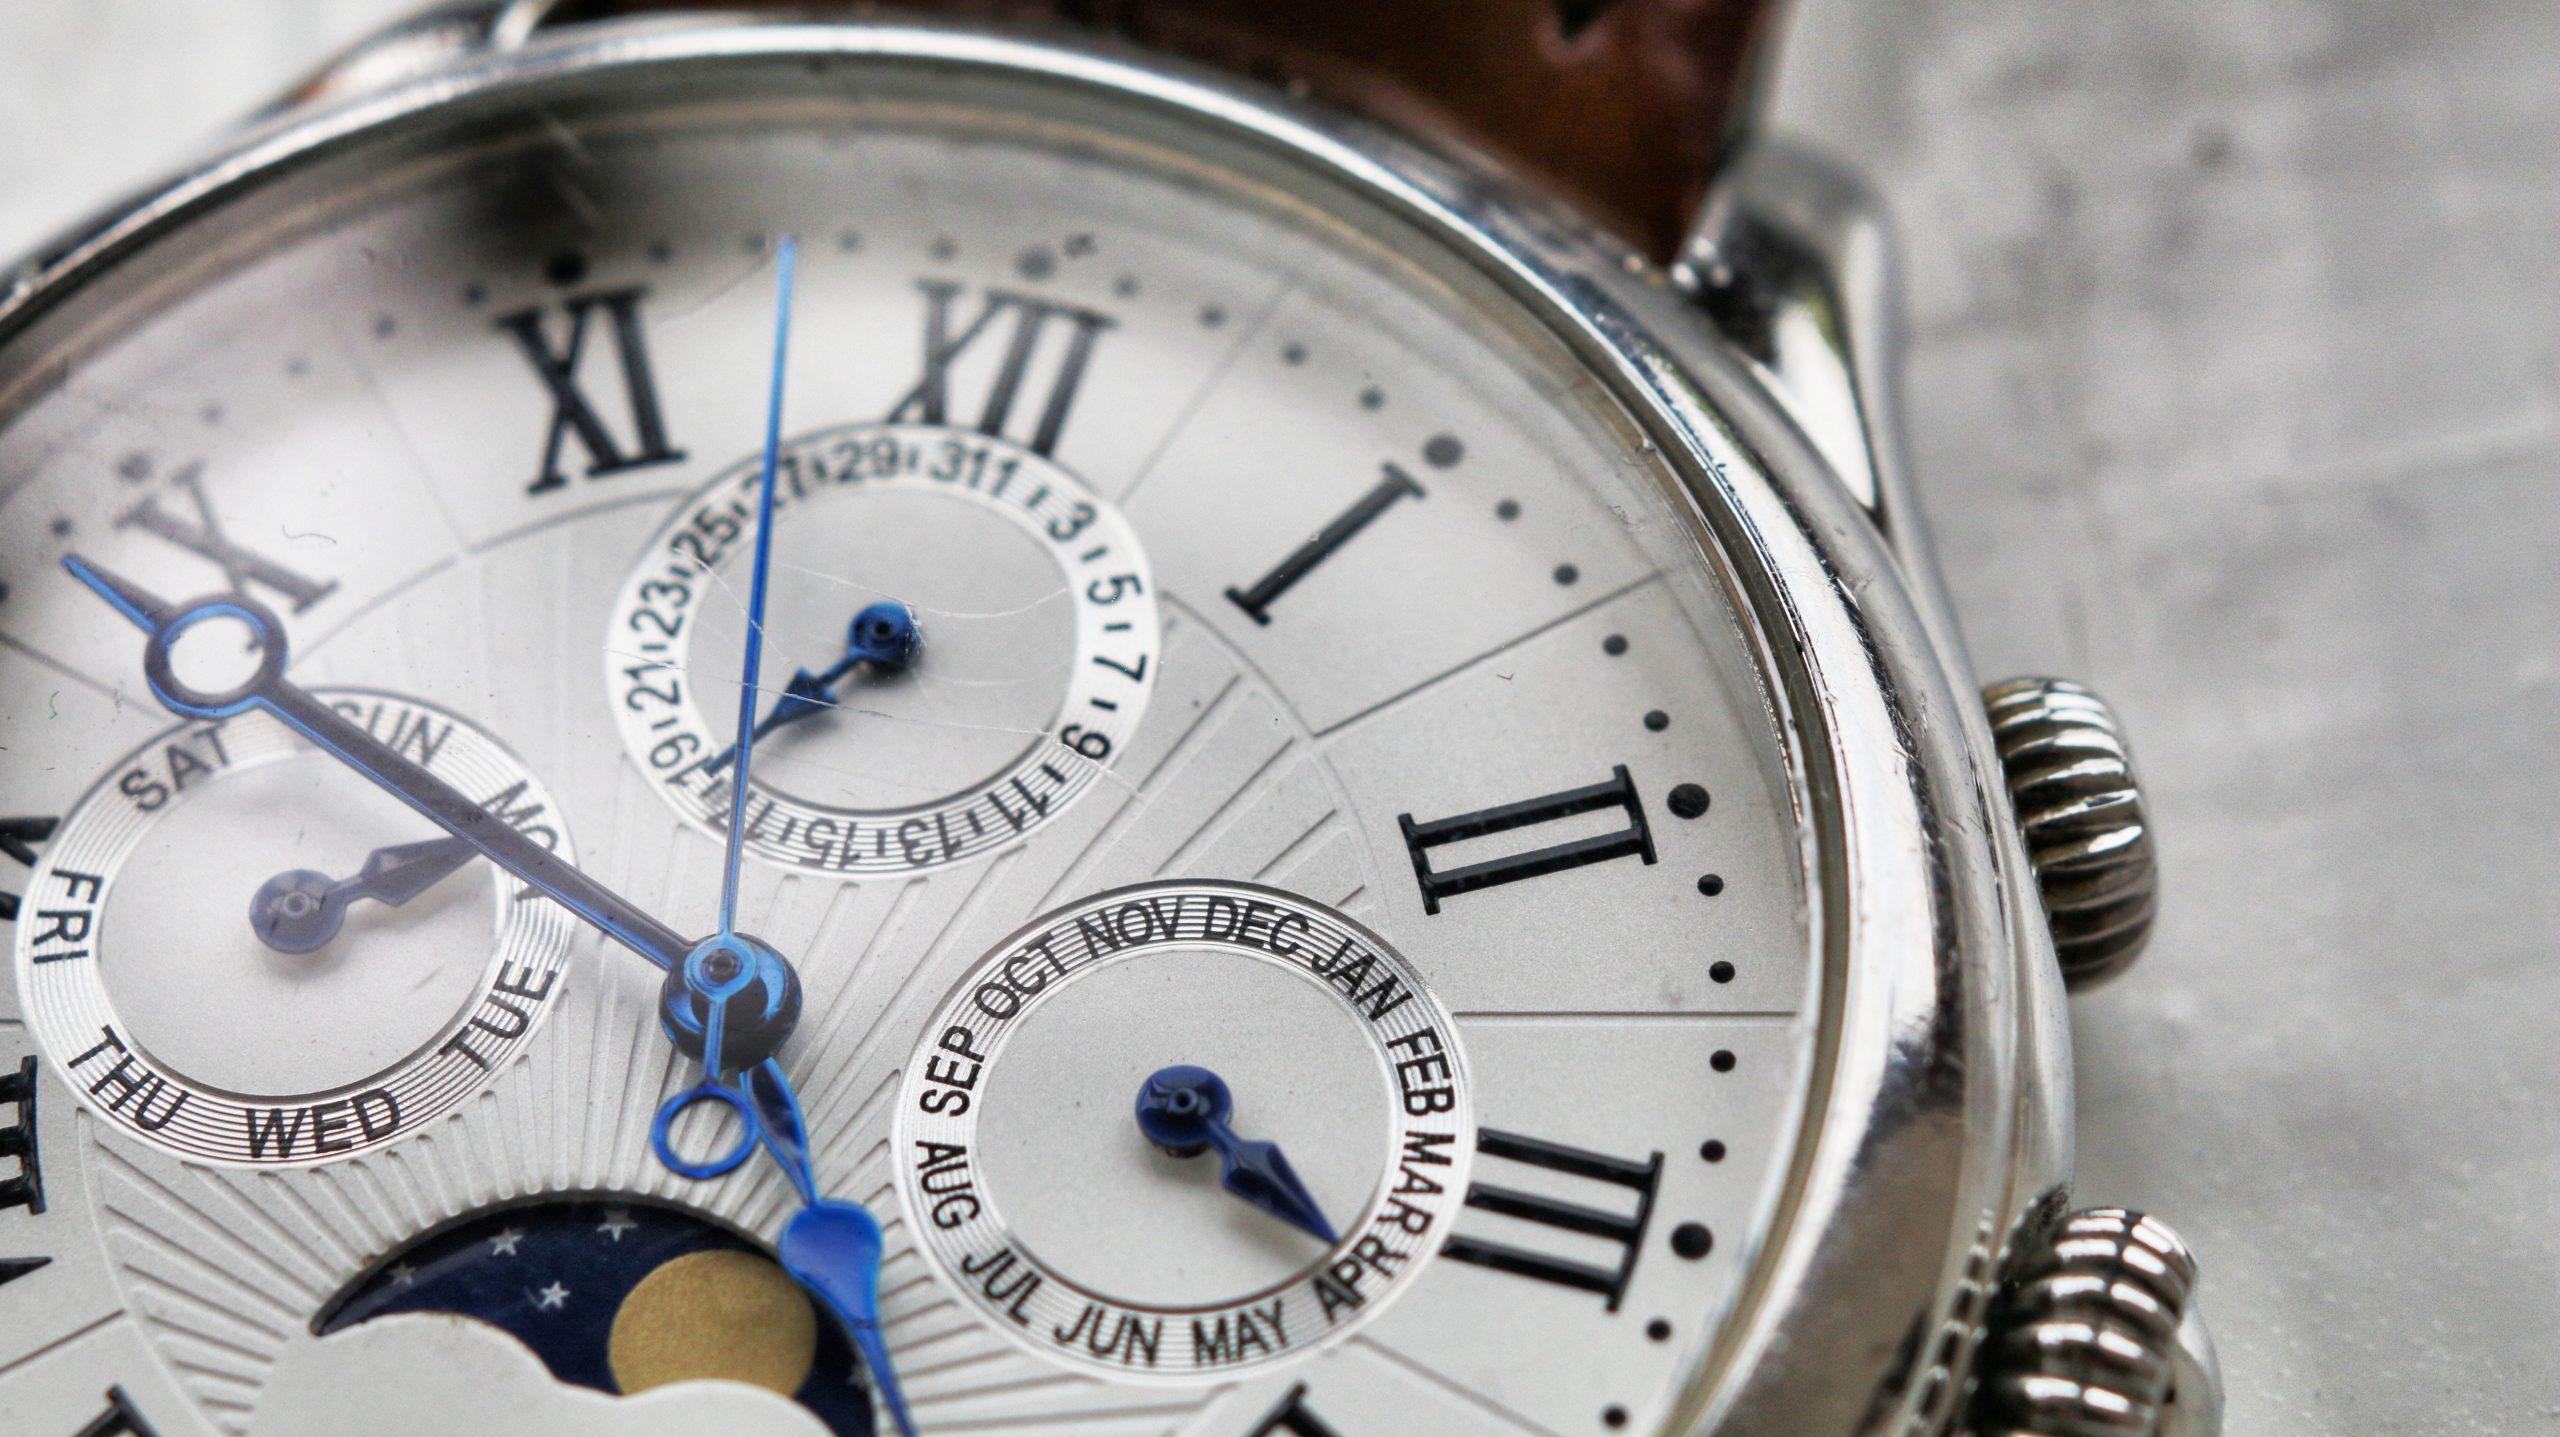 Clock face depicting meeting minutes